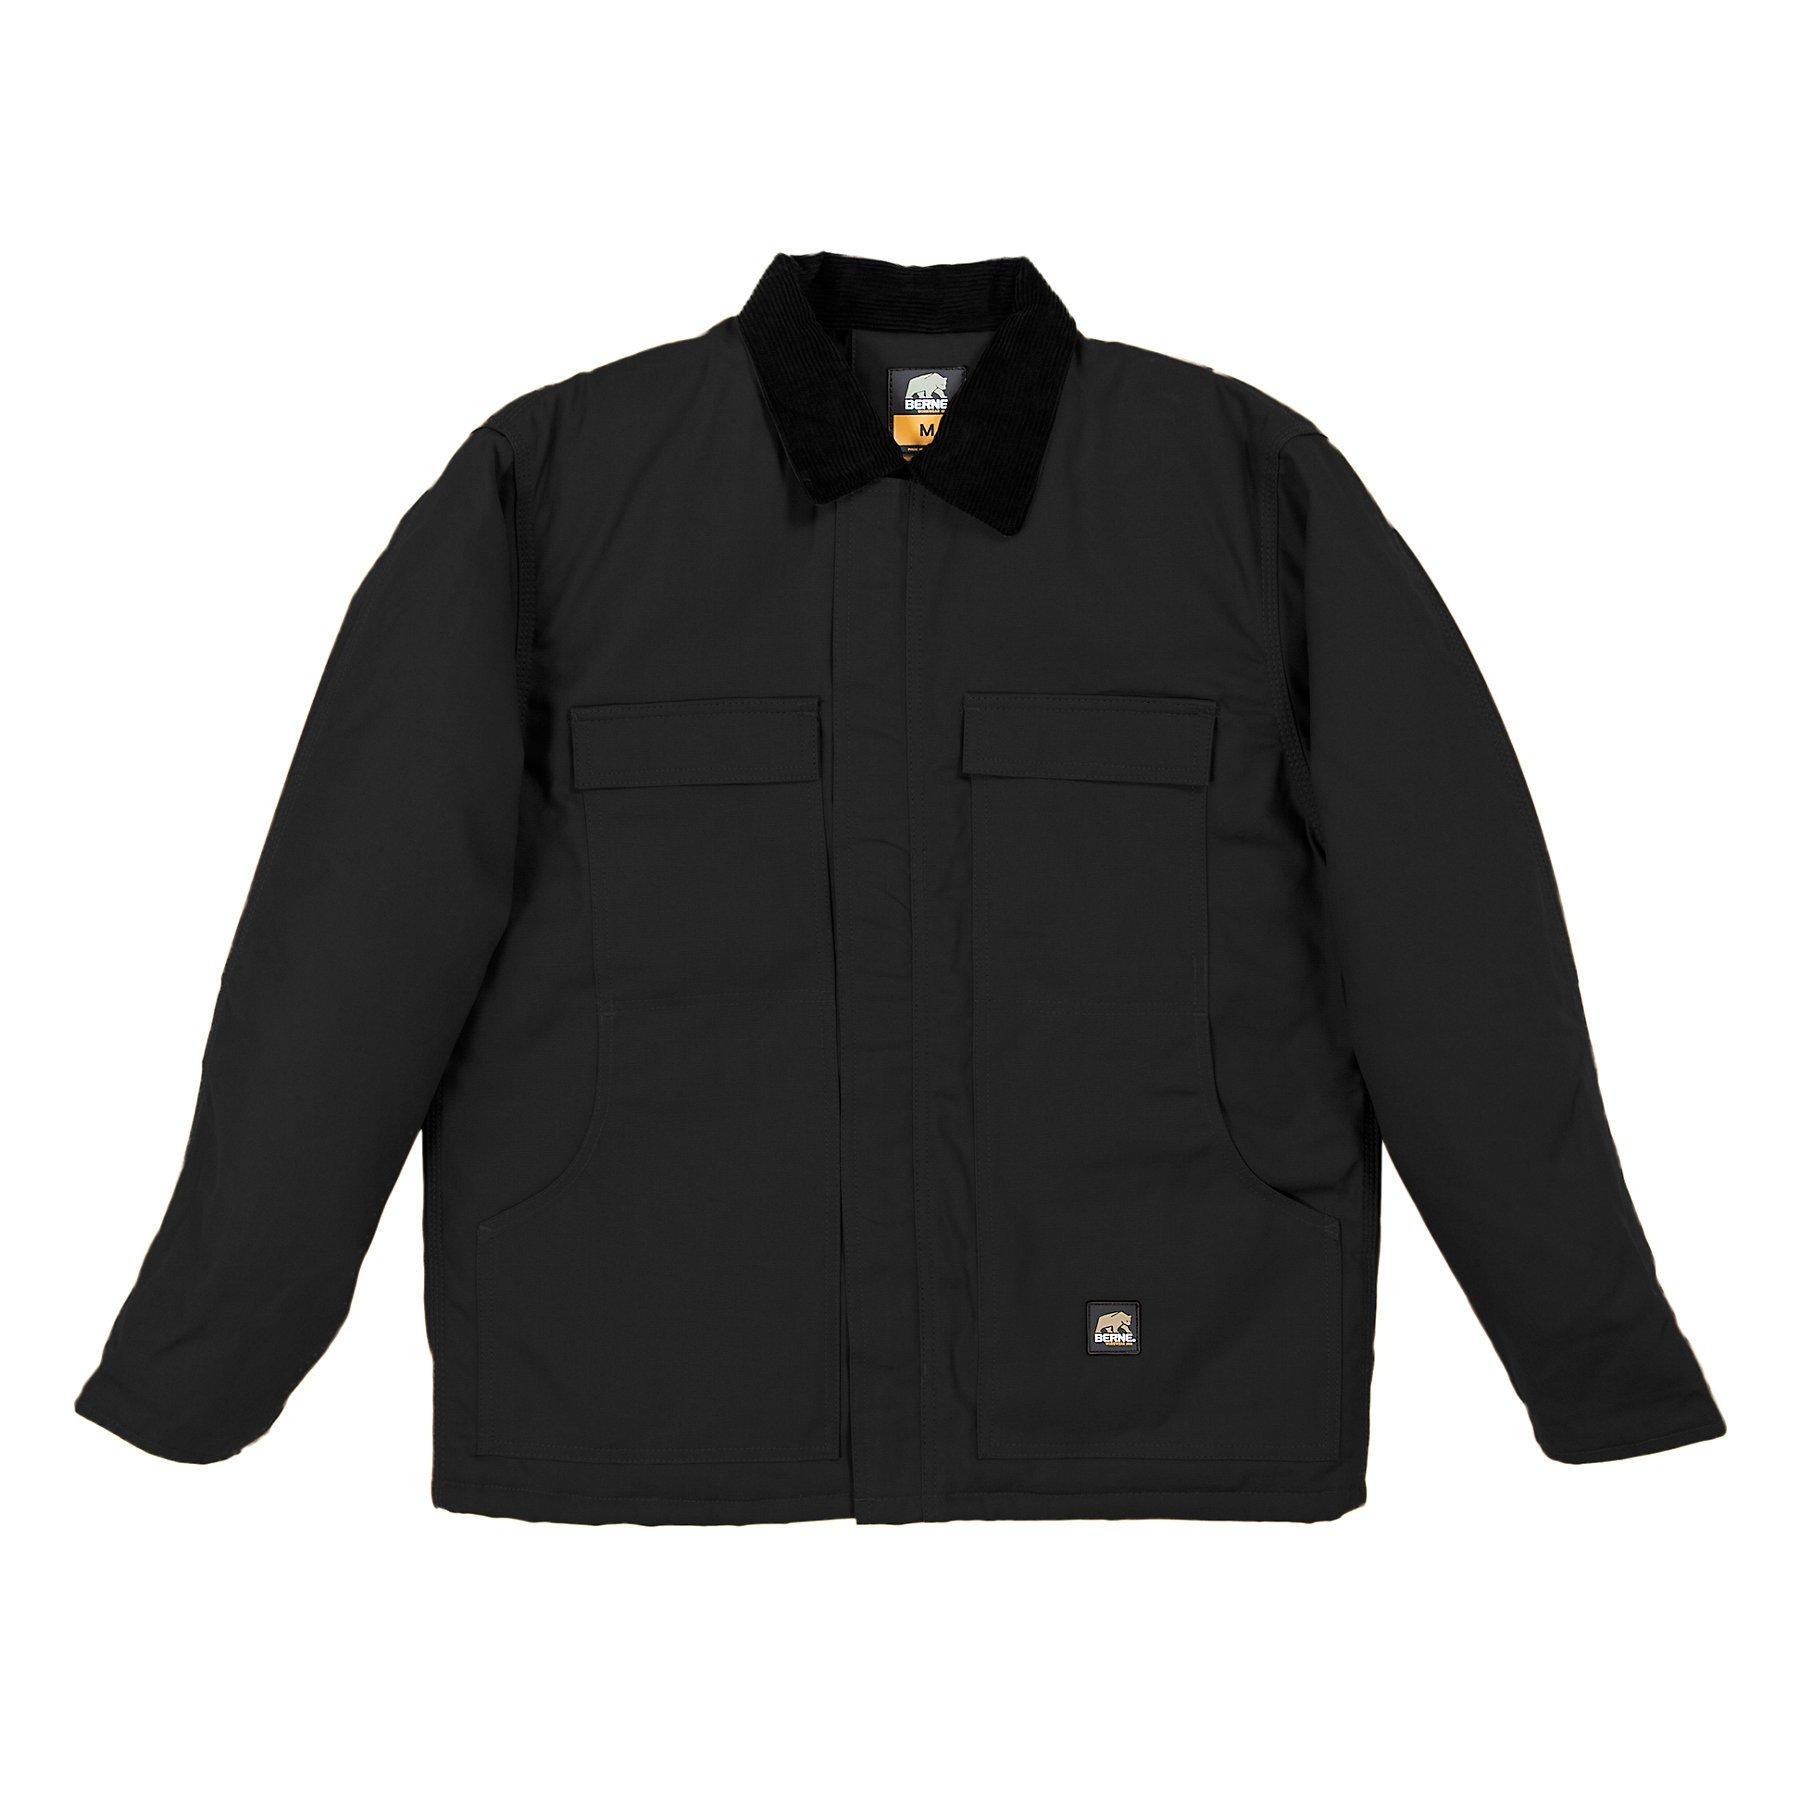 Berne-Apparel-Big-Tall-Chore-Coat-Black